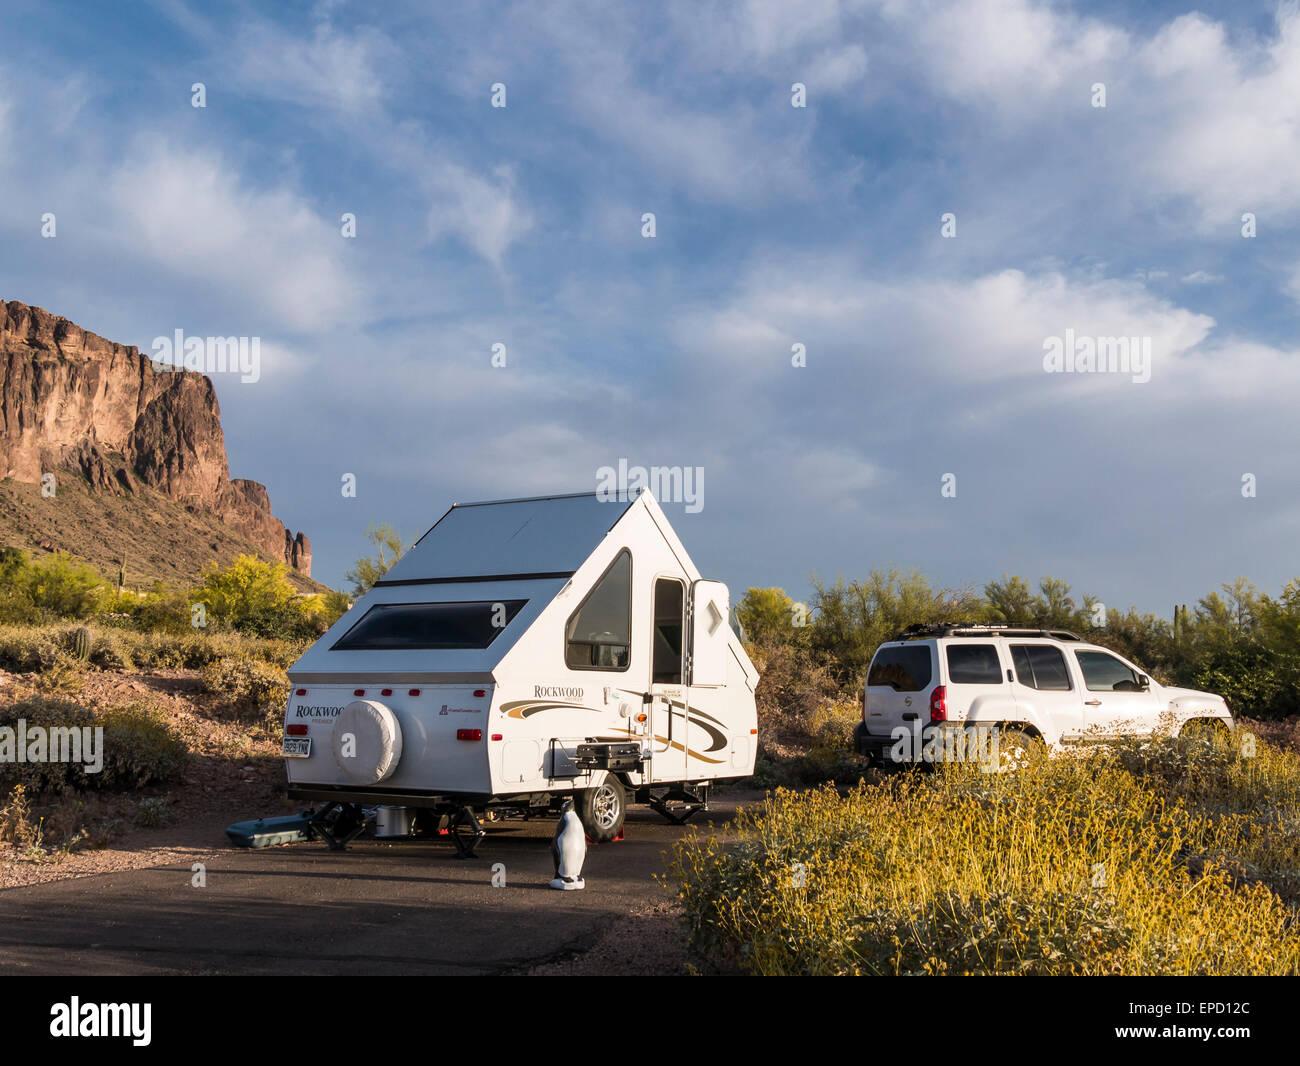 A-frame camper at campsite 32, Lost Dutchman State Park, Apache ...